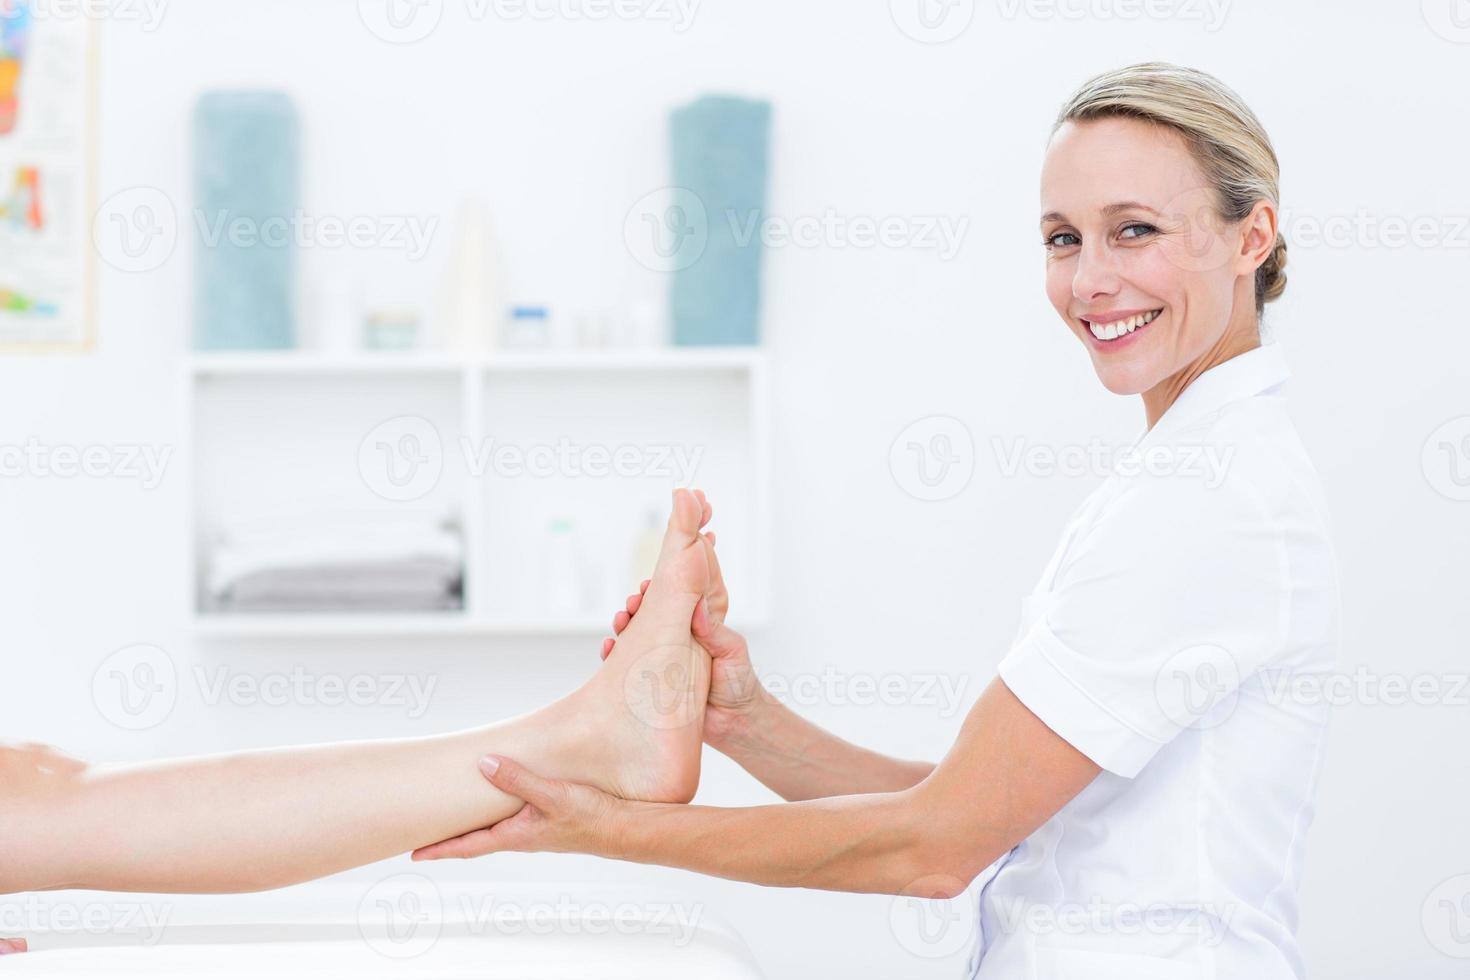 fysiotherapeut die voetmassage doet foto